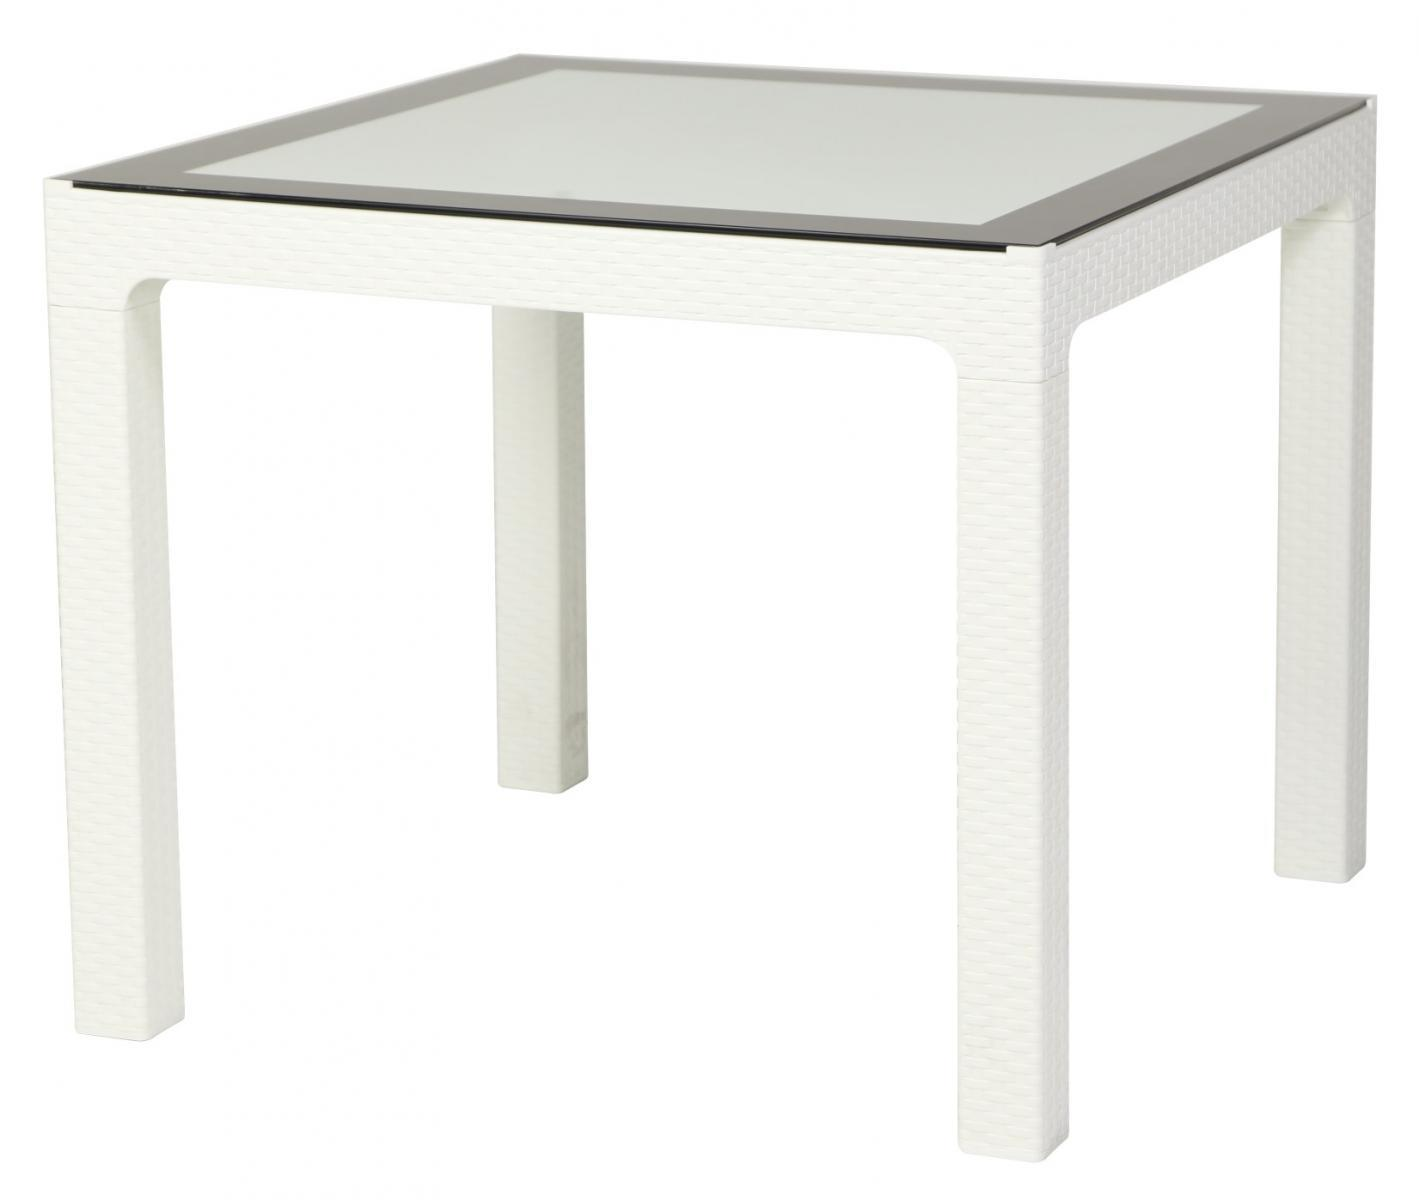 Стол пластиковый Arizona 90x90 Table